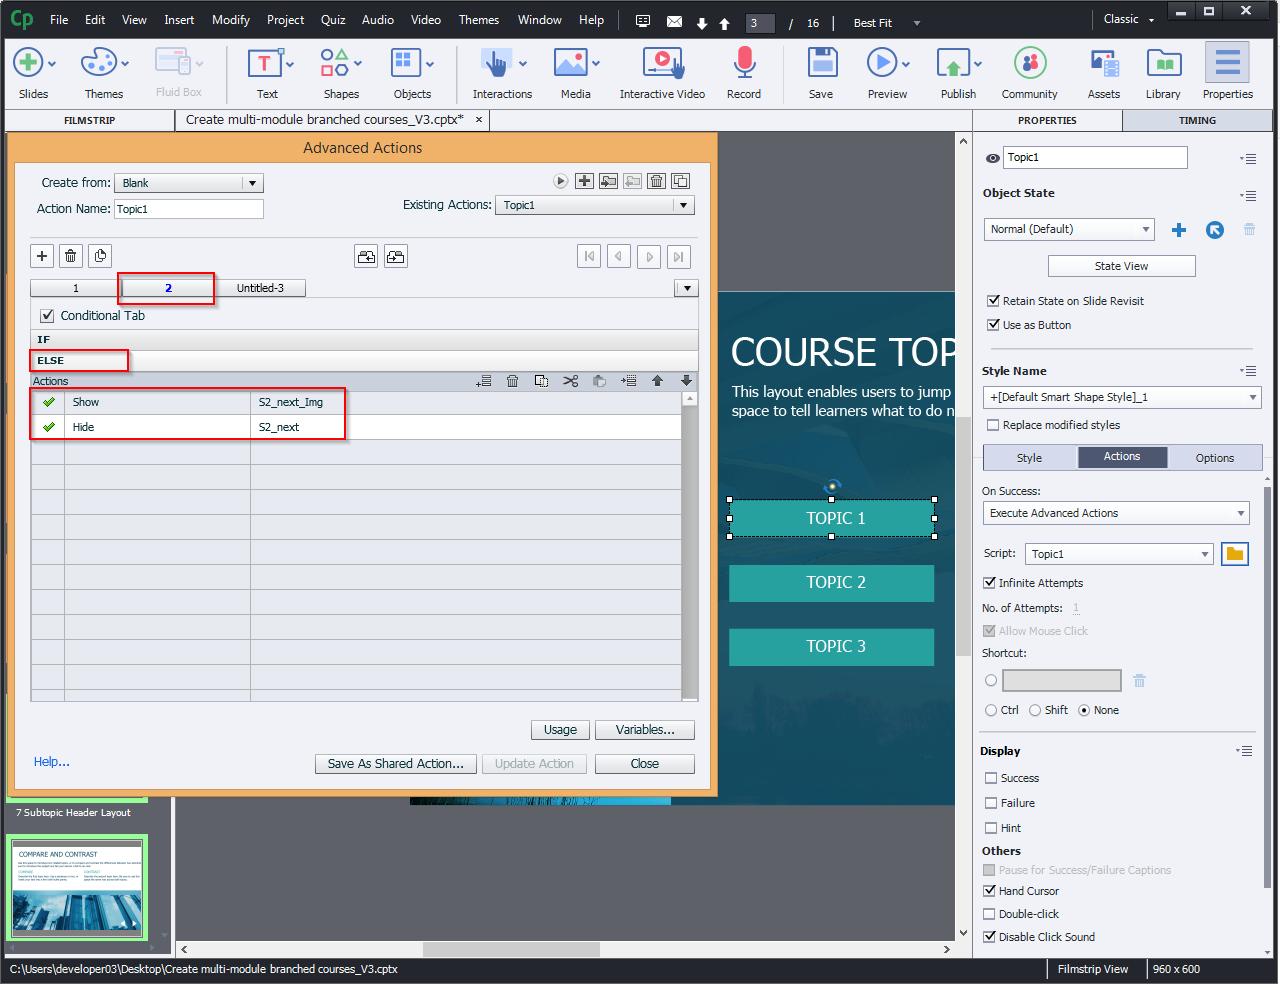 Create multi-module branched courses 10.2